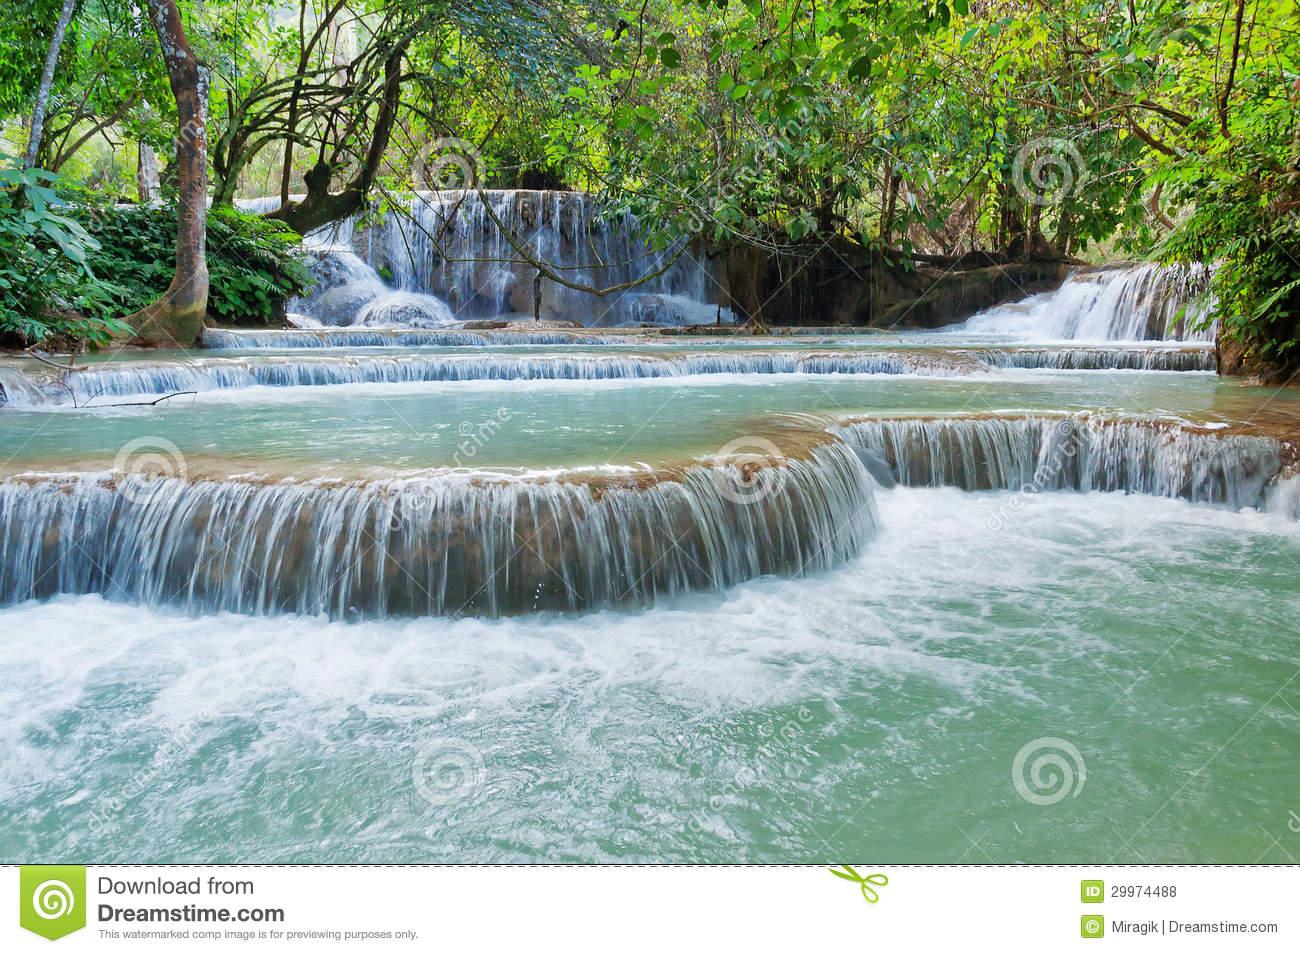 Kuang Si Waterfall clipart #16, Download drawings